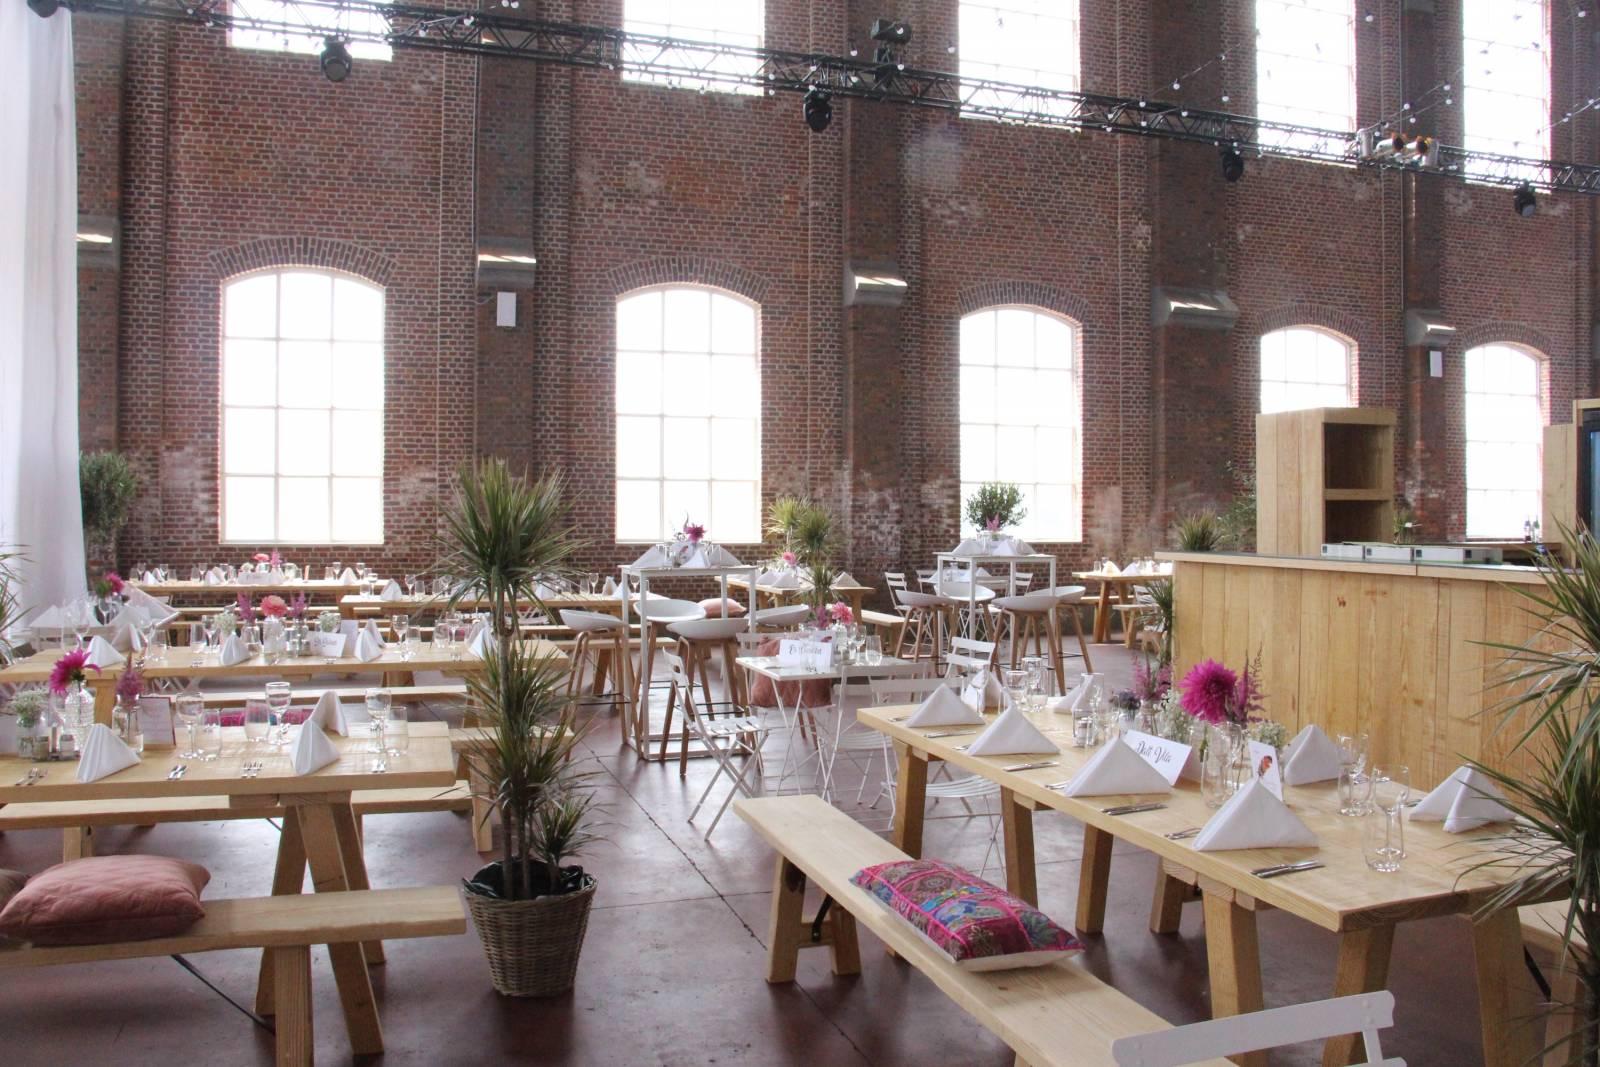 Hangar 43 - Feestzaal Oost-Vlaanderen - Industrieel - House of Weddings - 17